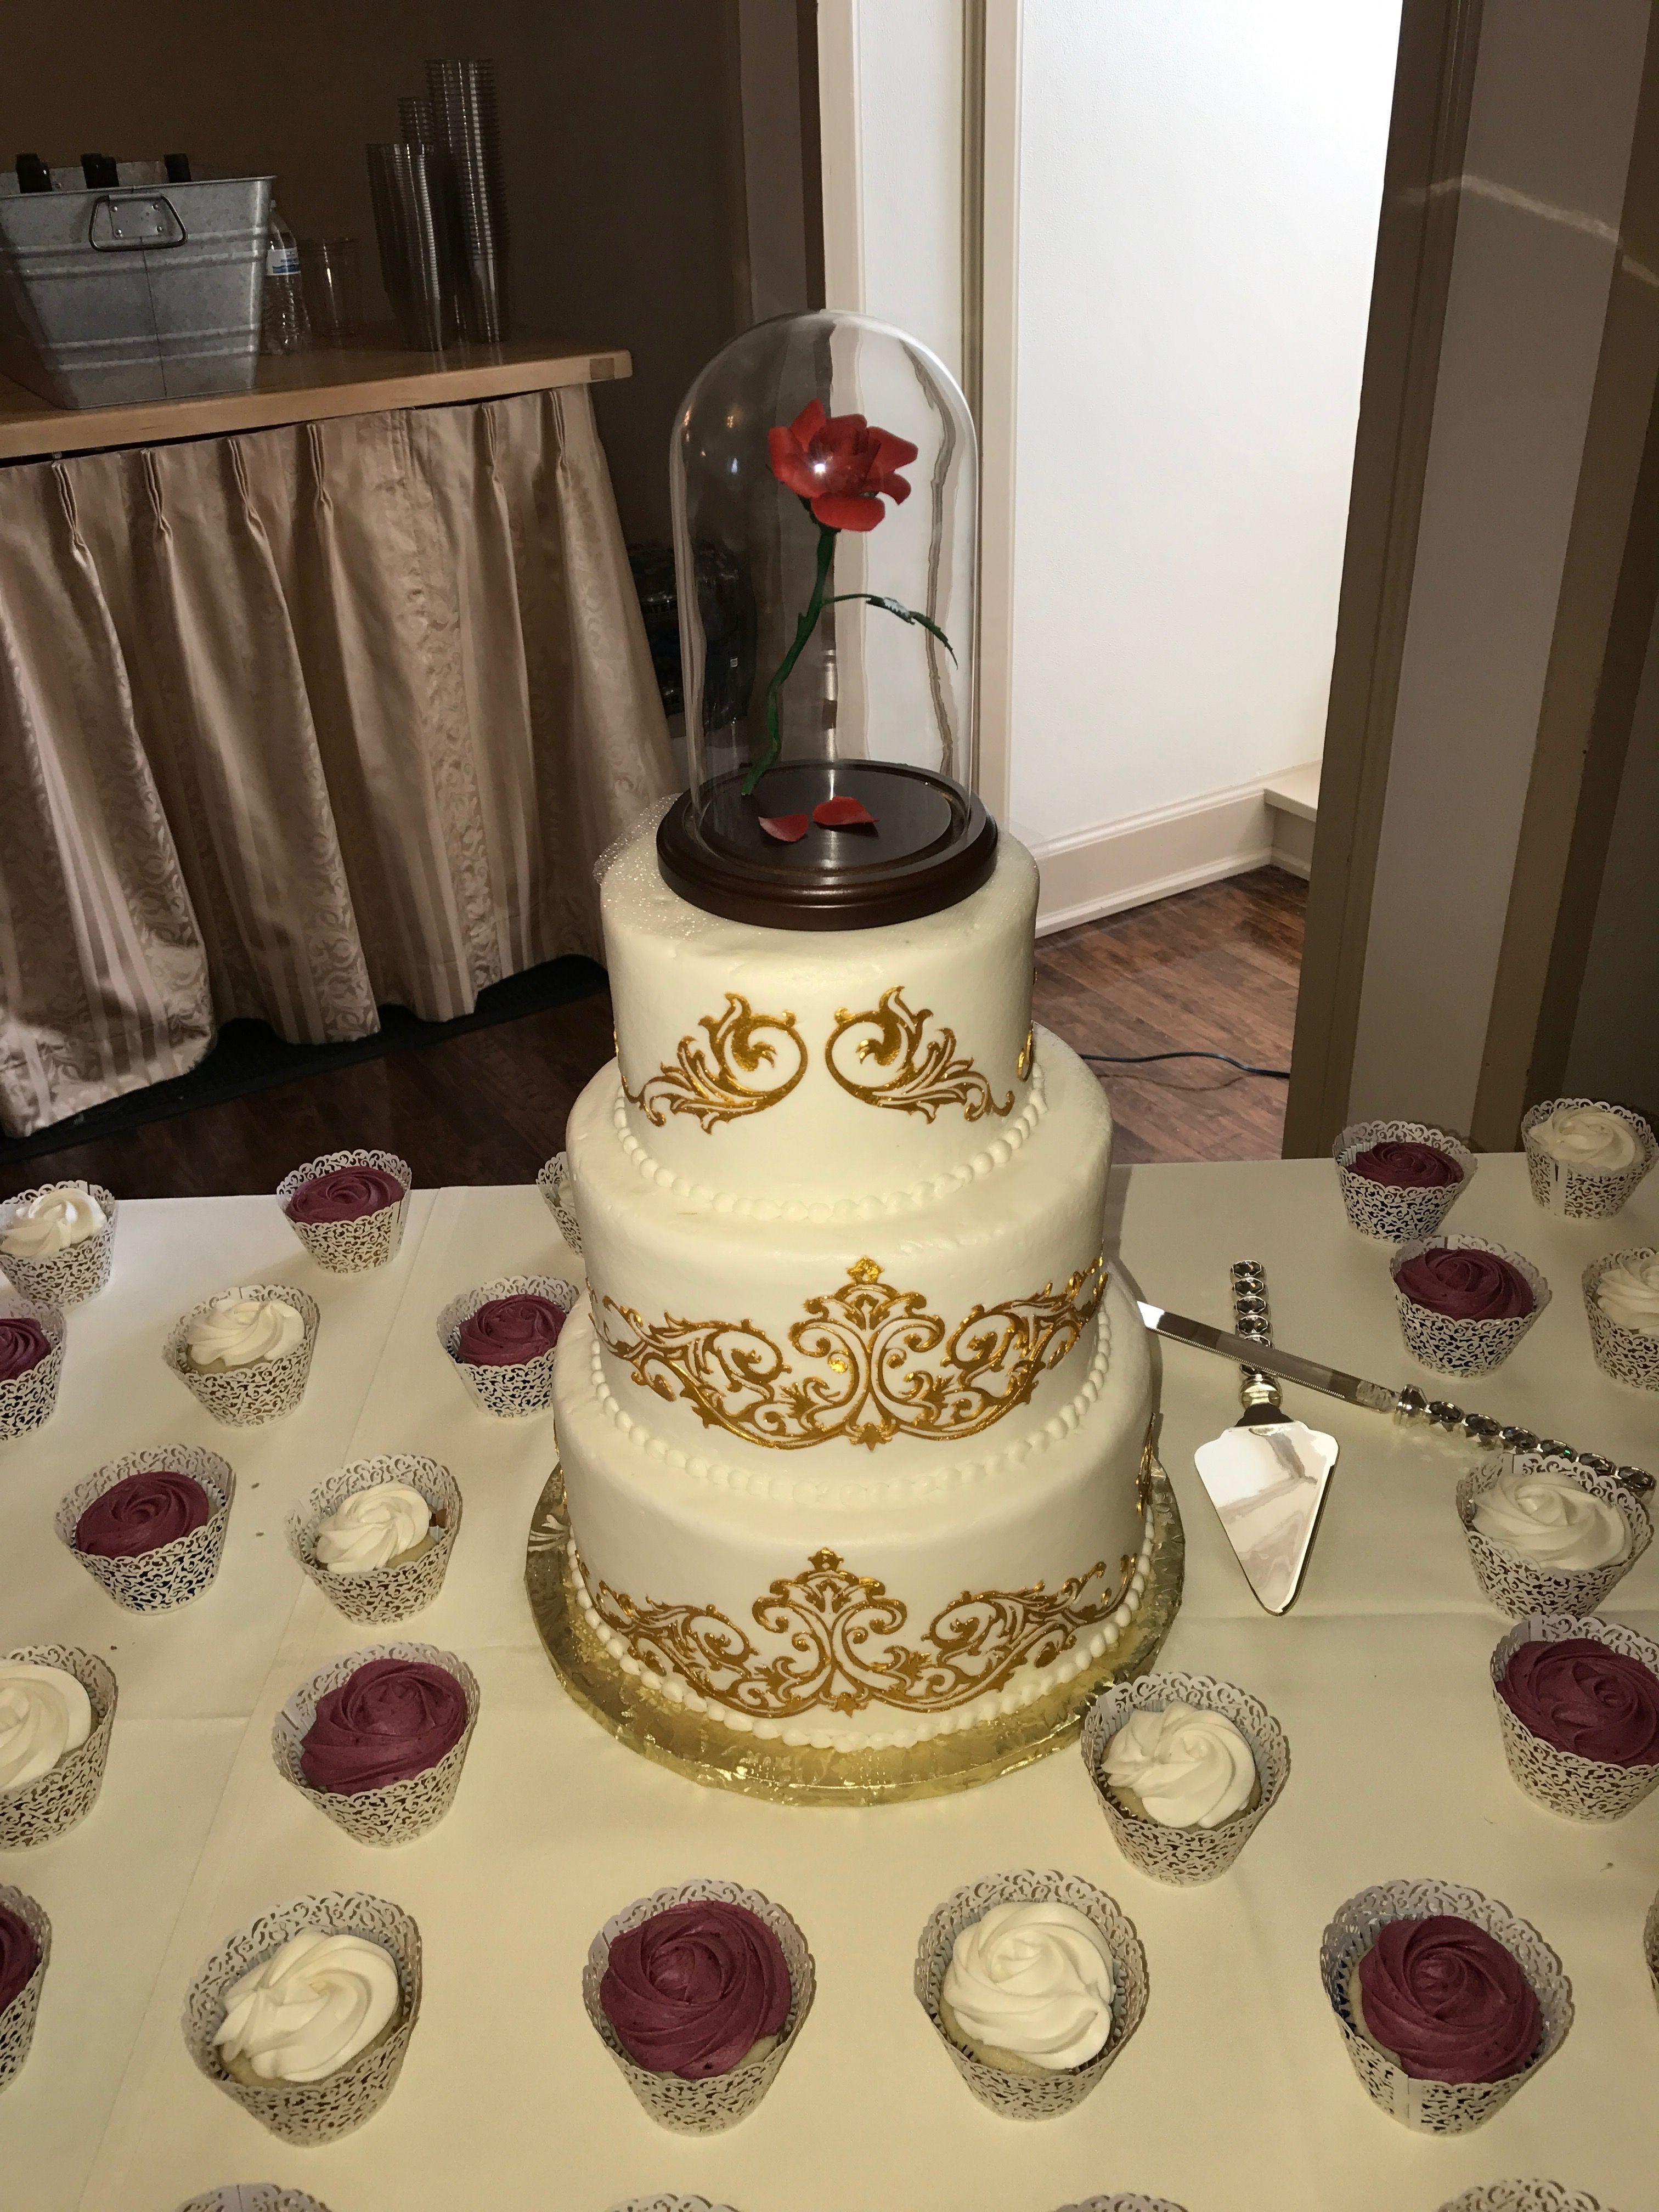 Beauty and The Beast Theme Wedding Cake #FeltEstate  #WeddingsAtFeltEstate